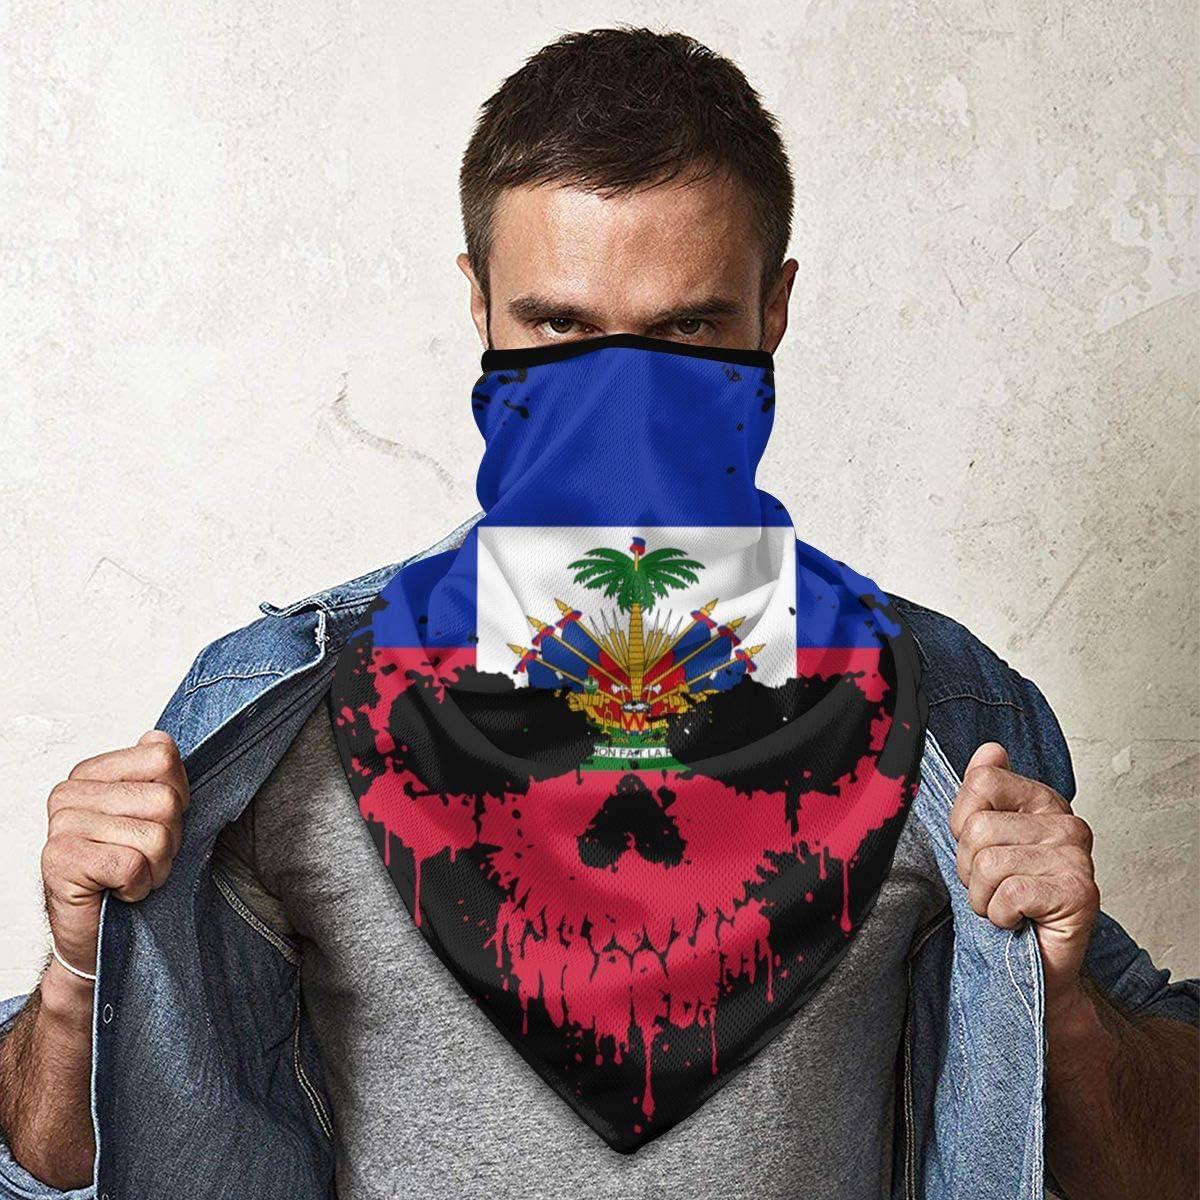 B07YDWBNJJ Haitian Haiti Skull Flag Face Mask Neck Gaiters Bandana Scarf Balaclava Multifunctional Headwear for Outdoor Sports Black 61UwPK8bq2L